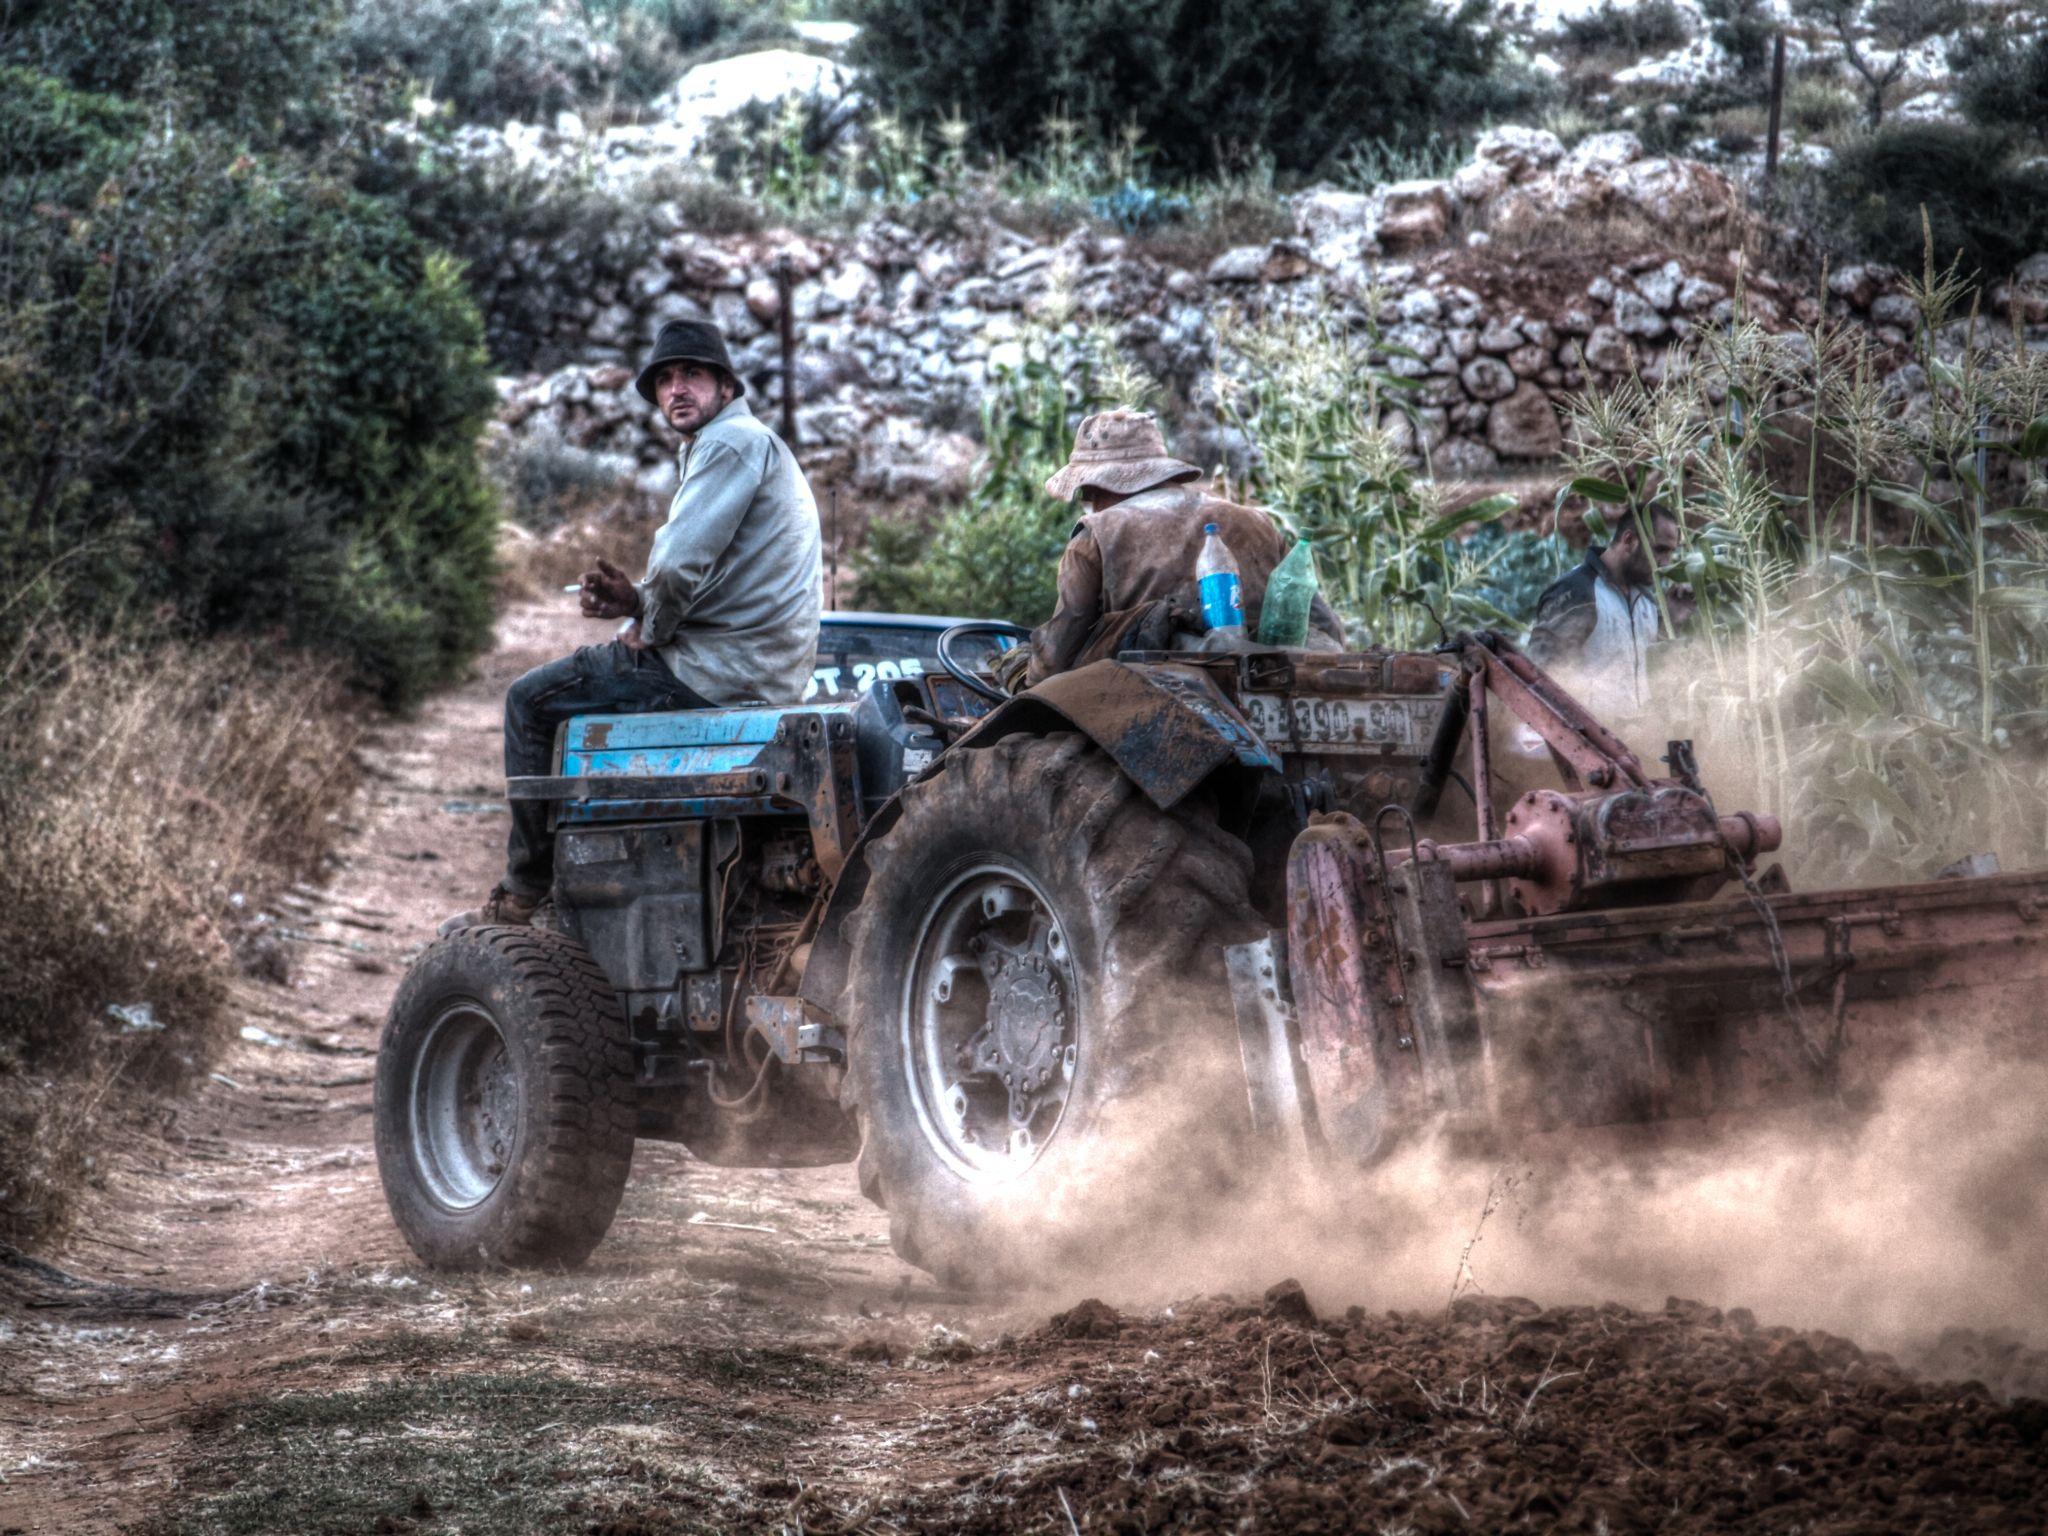 Harvest by AhmadZalloum